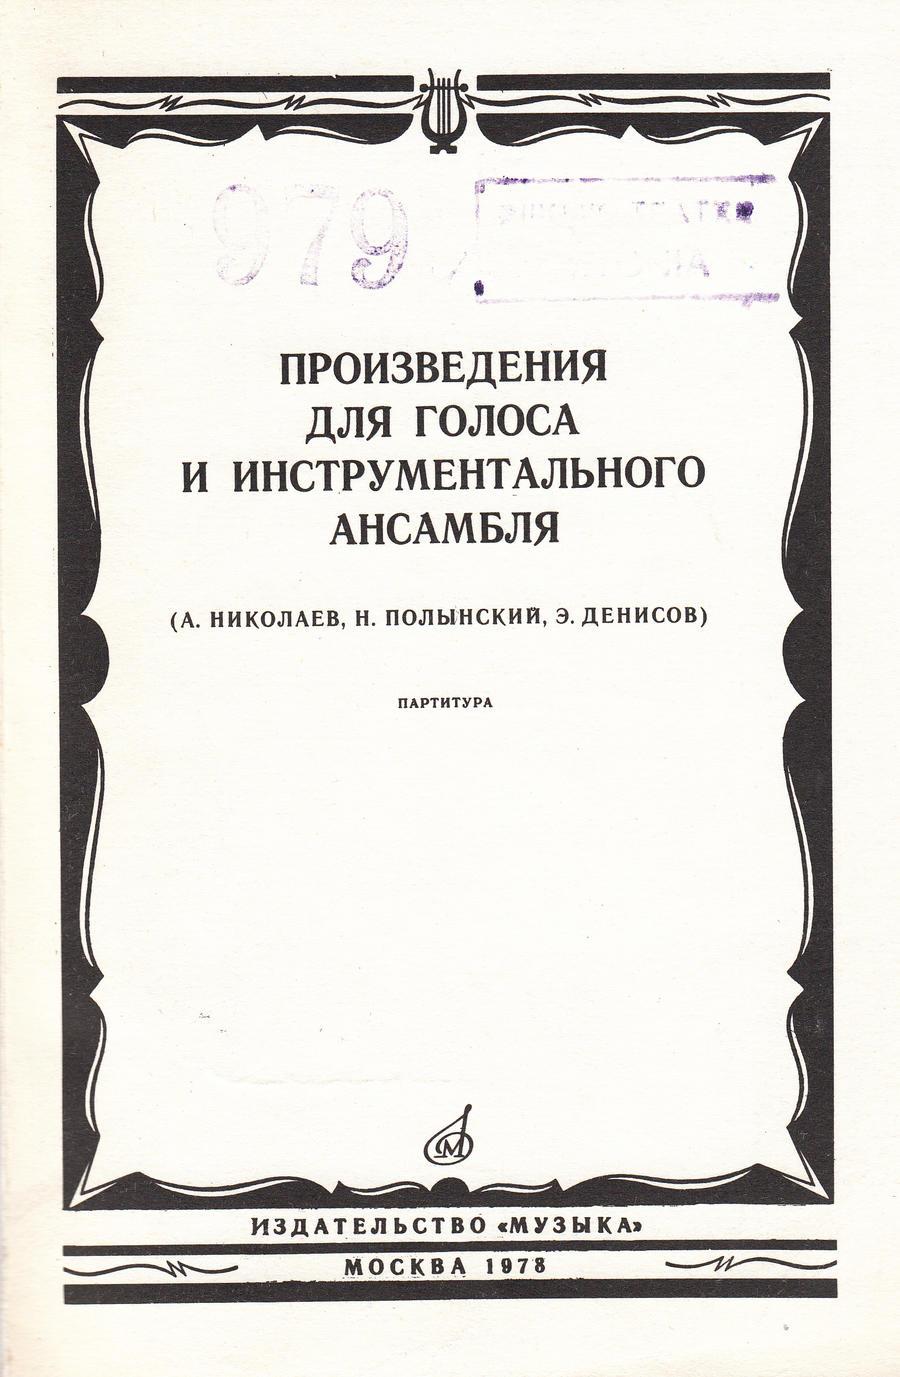 Kogumik Nikolaev, Polõnski, Denissov_0001